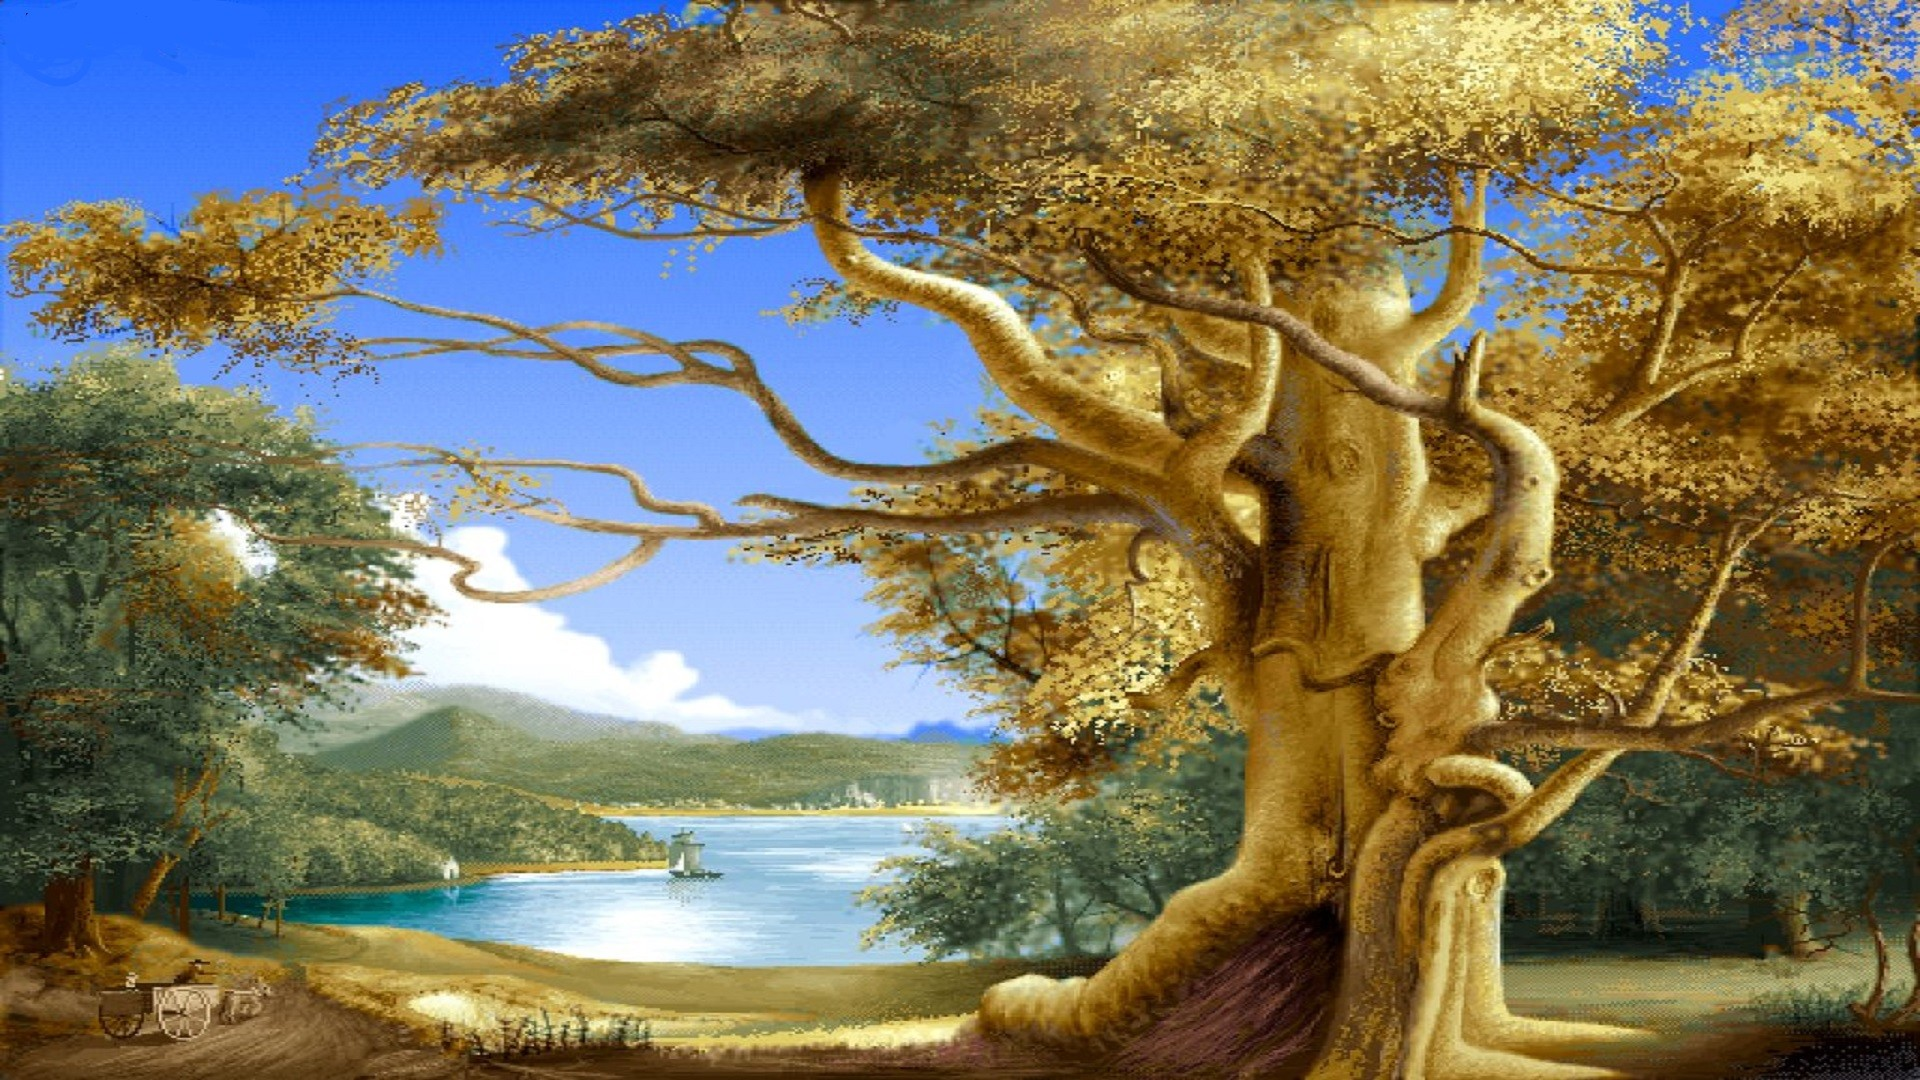 new nature wallpaper 183��